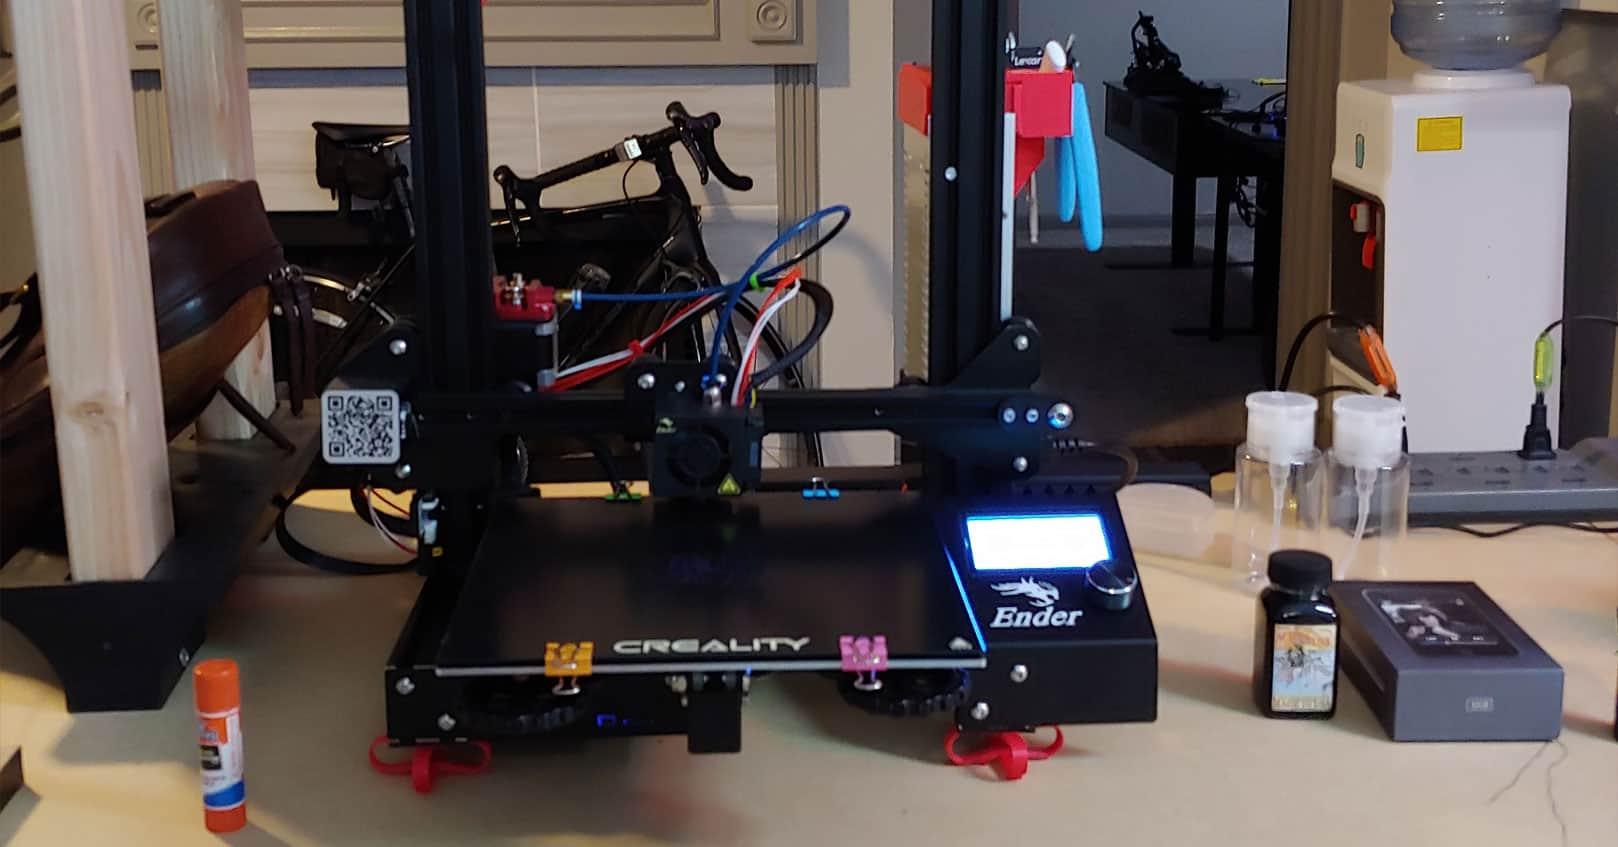 Using a #D printer